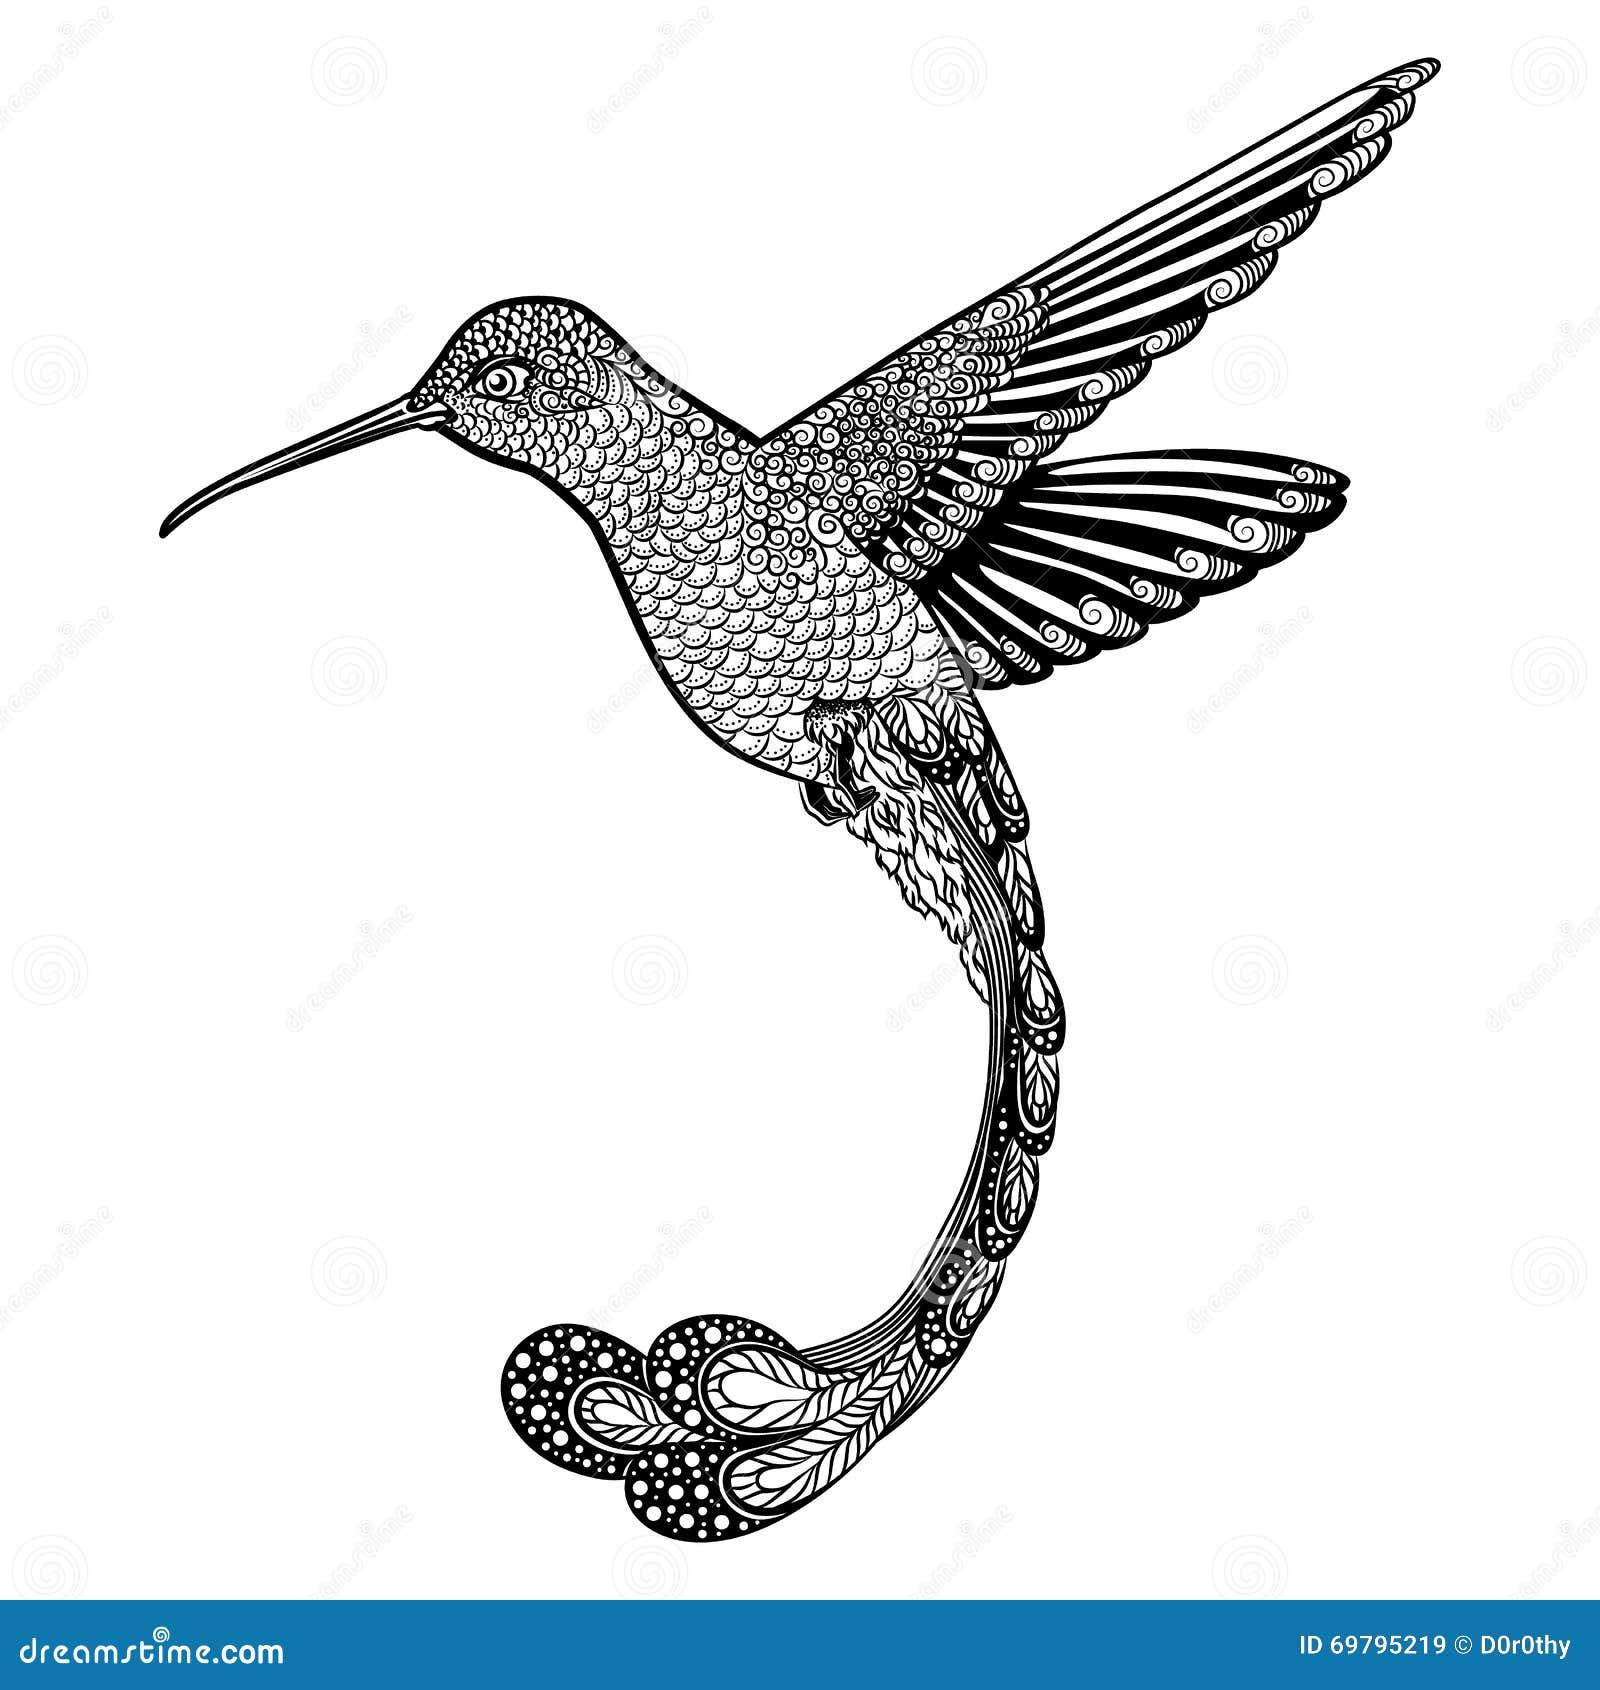 tatouage boussole et colibri